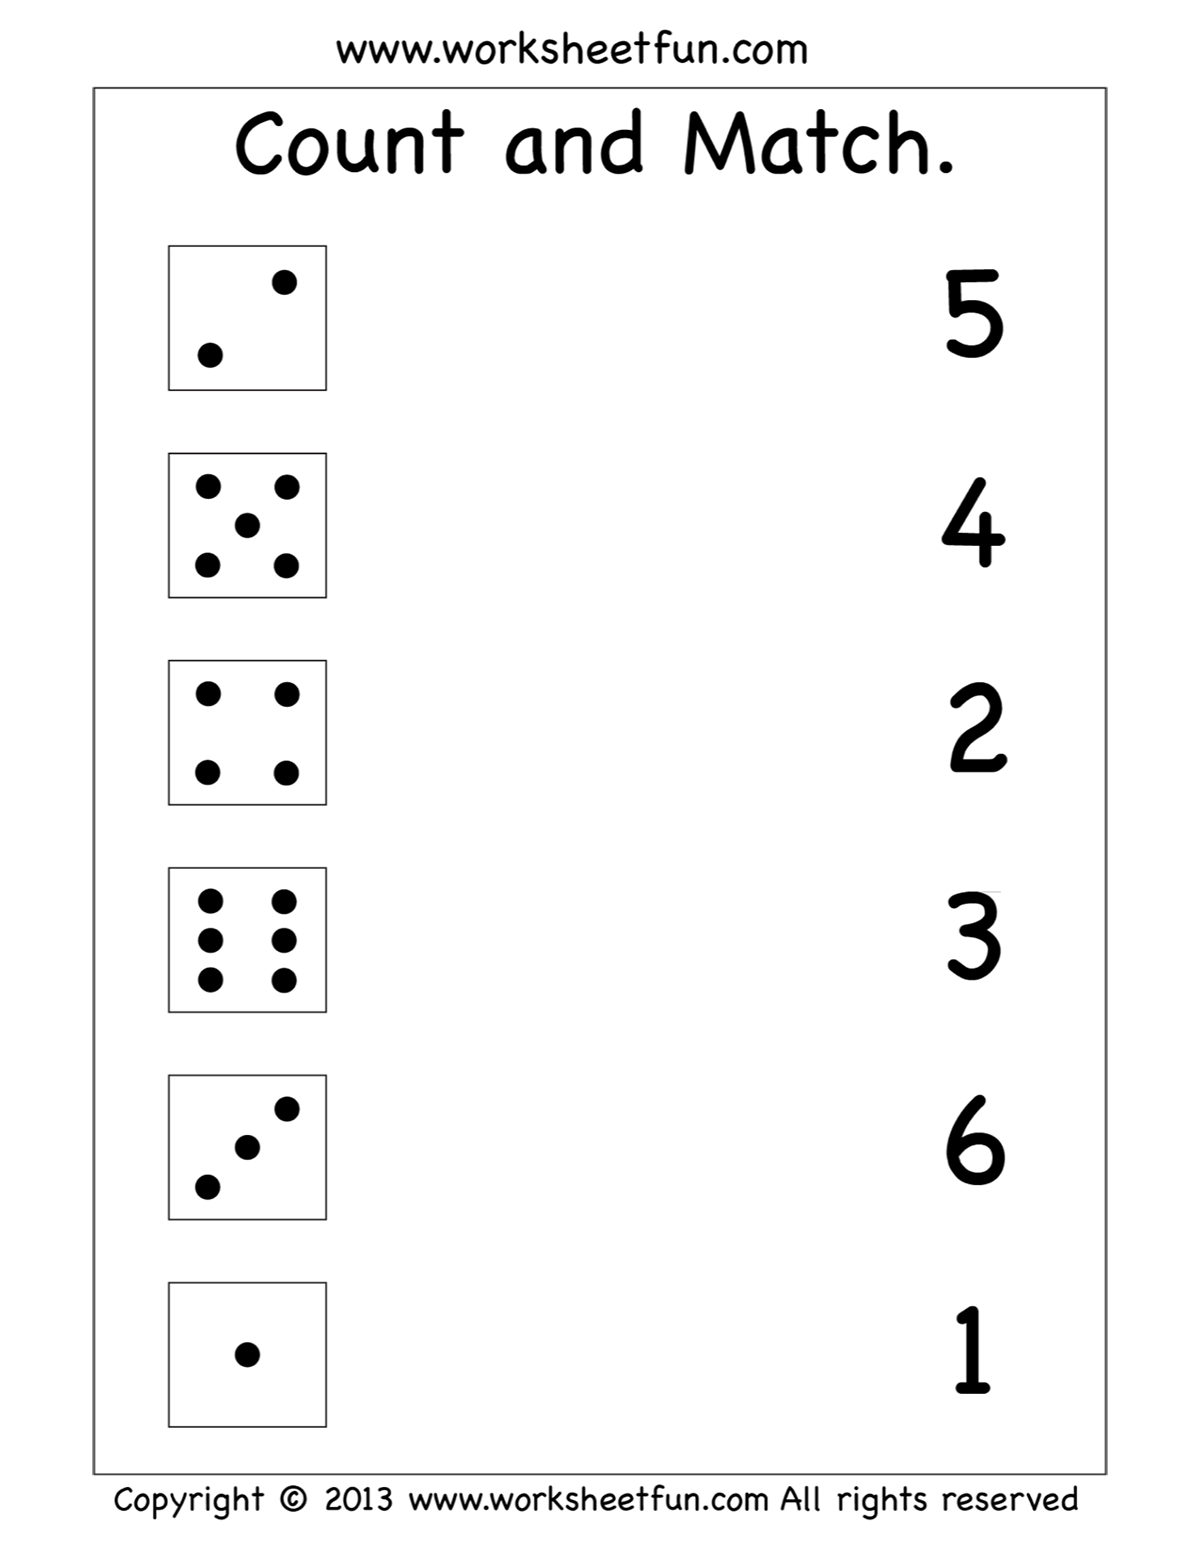 Count and match worksheet   Printable preschool worksheets [ 1553 x 1200 Pixel ]